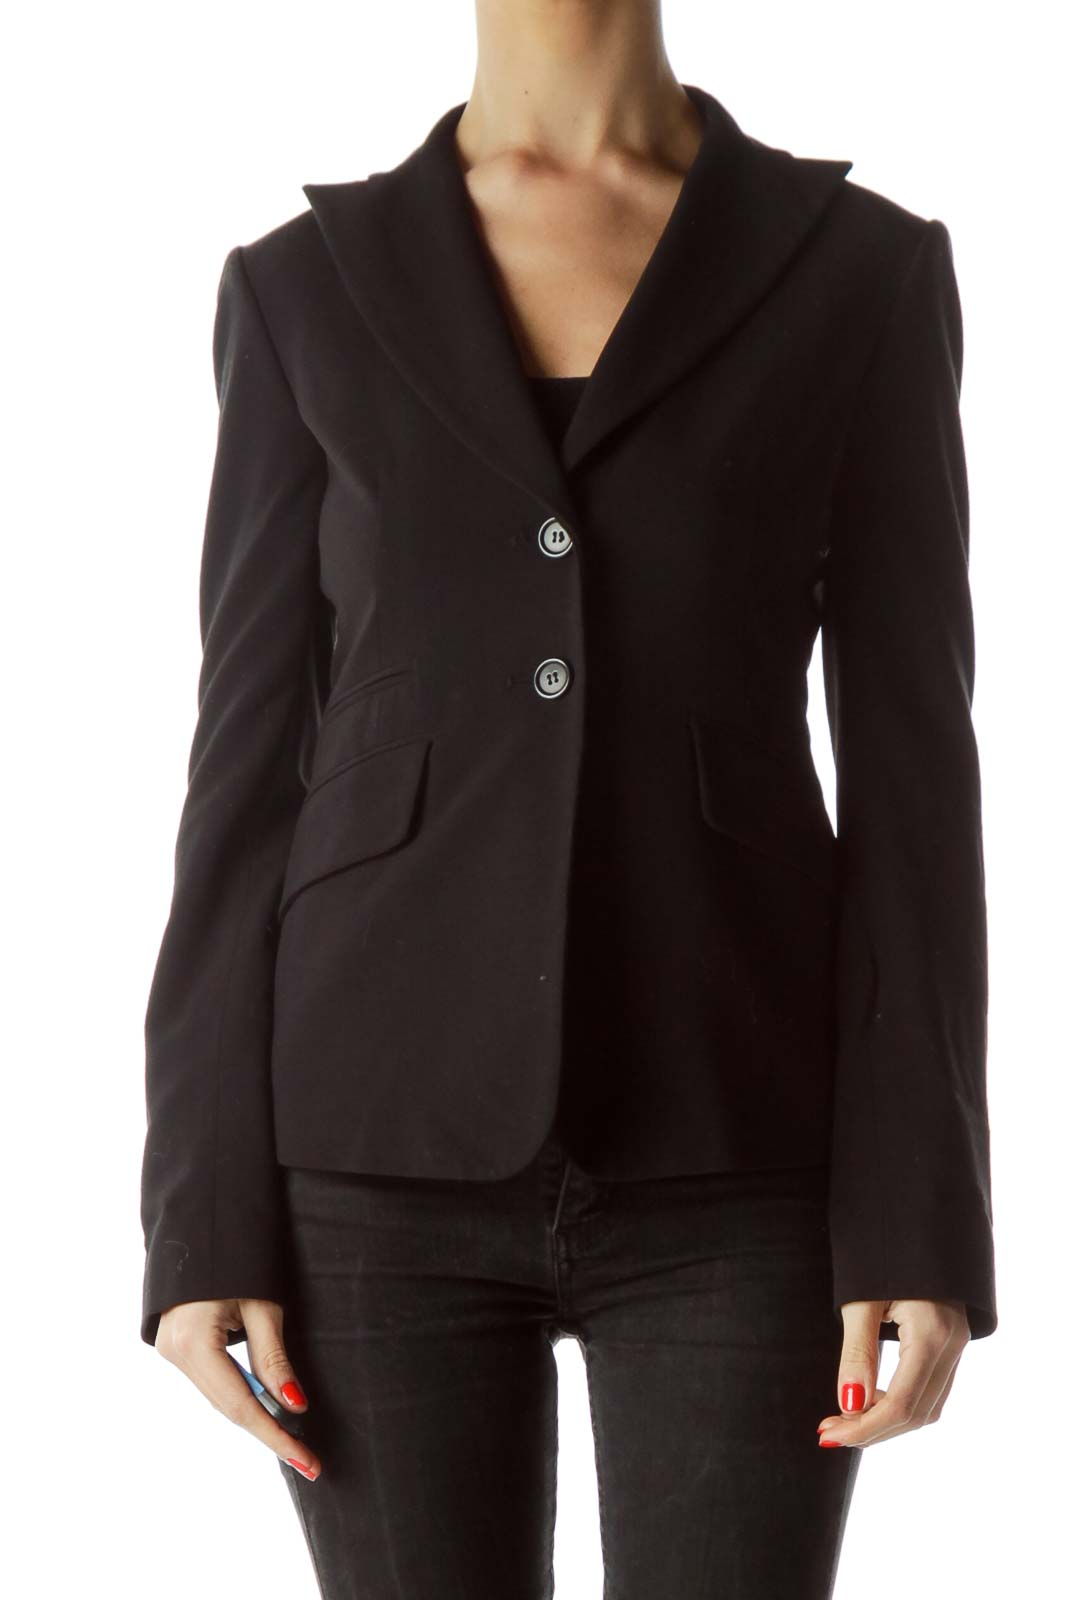 Black V-Neck Buttoned Blazer